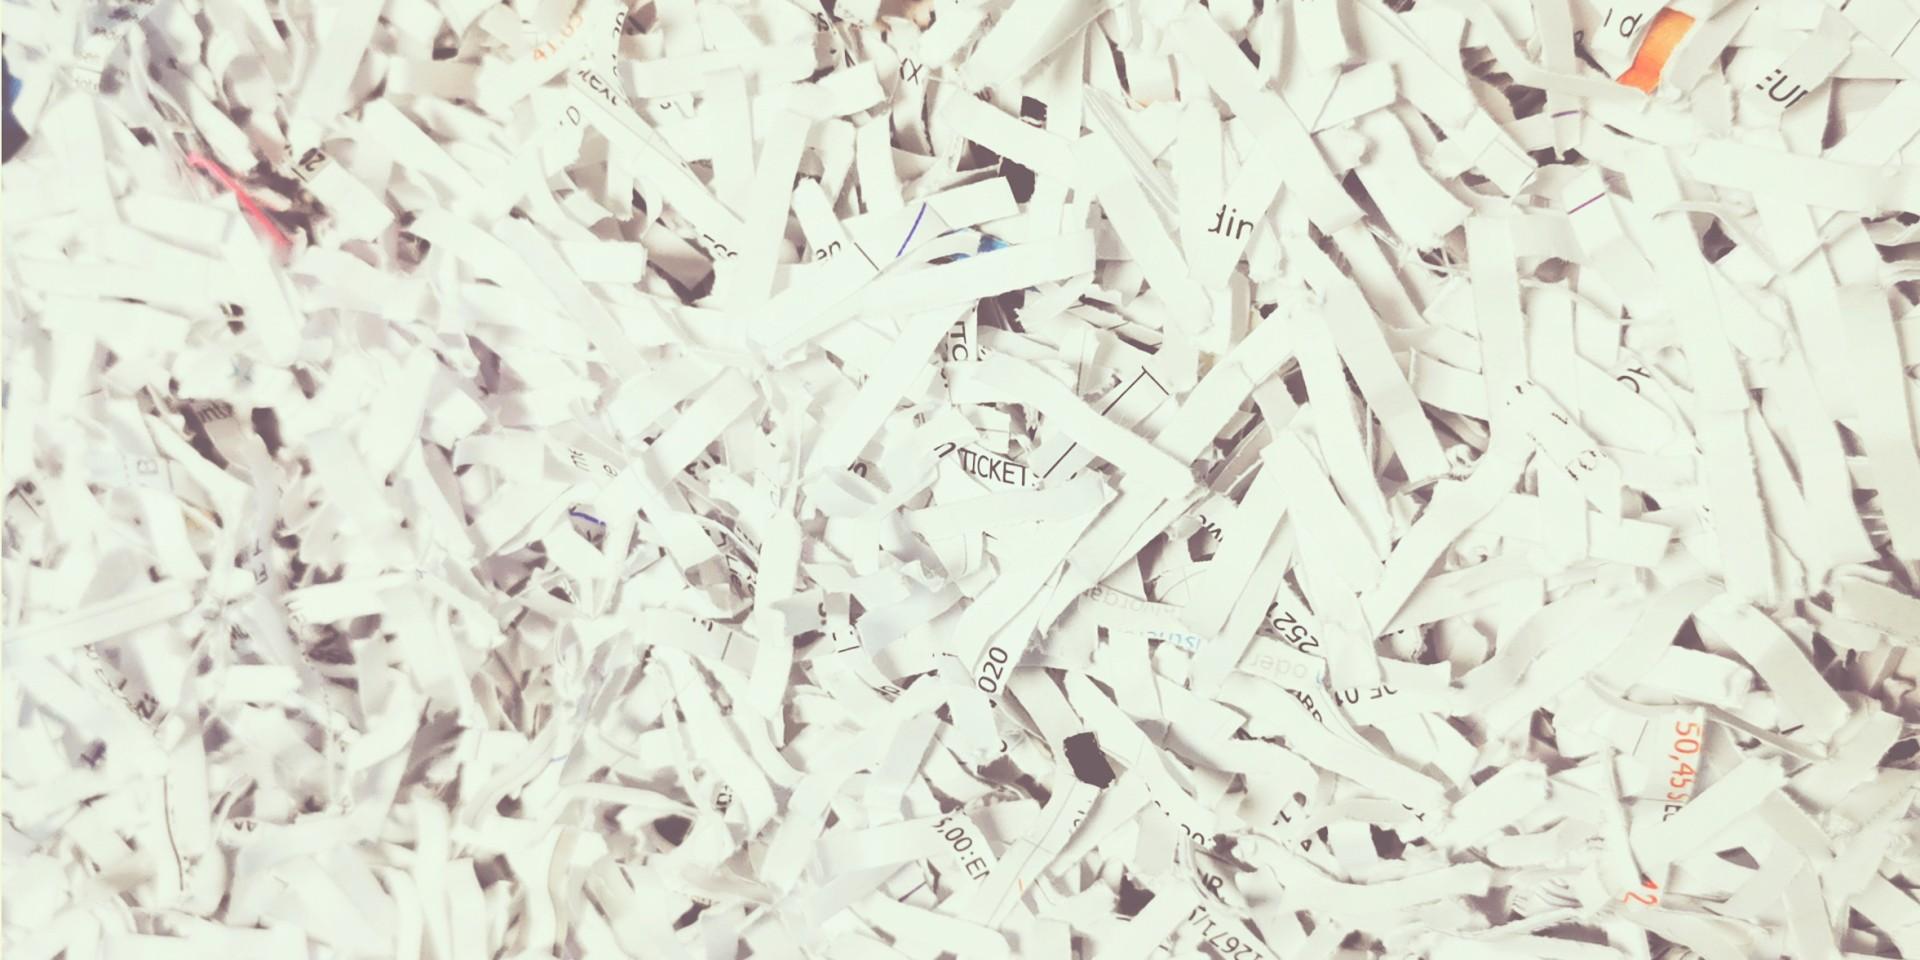 Geschredderte Dokumente